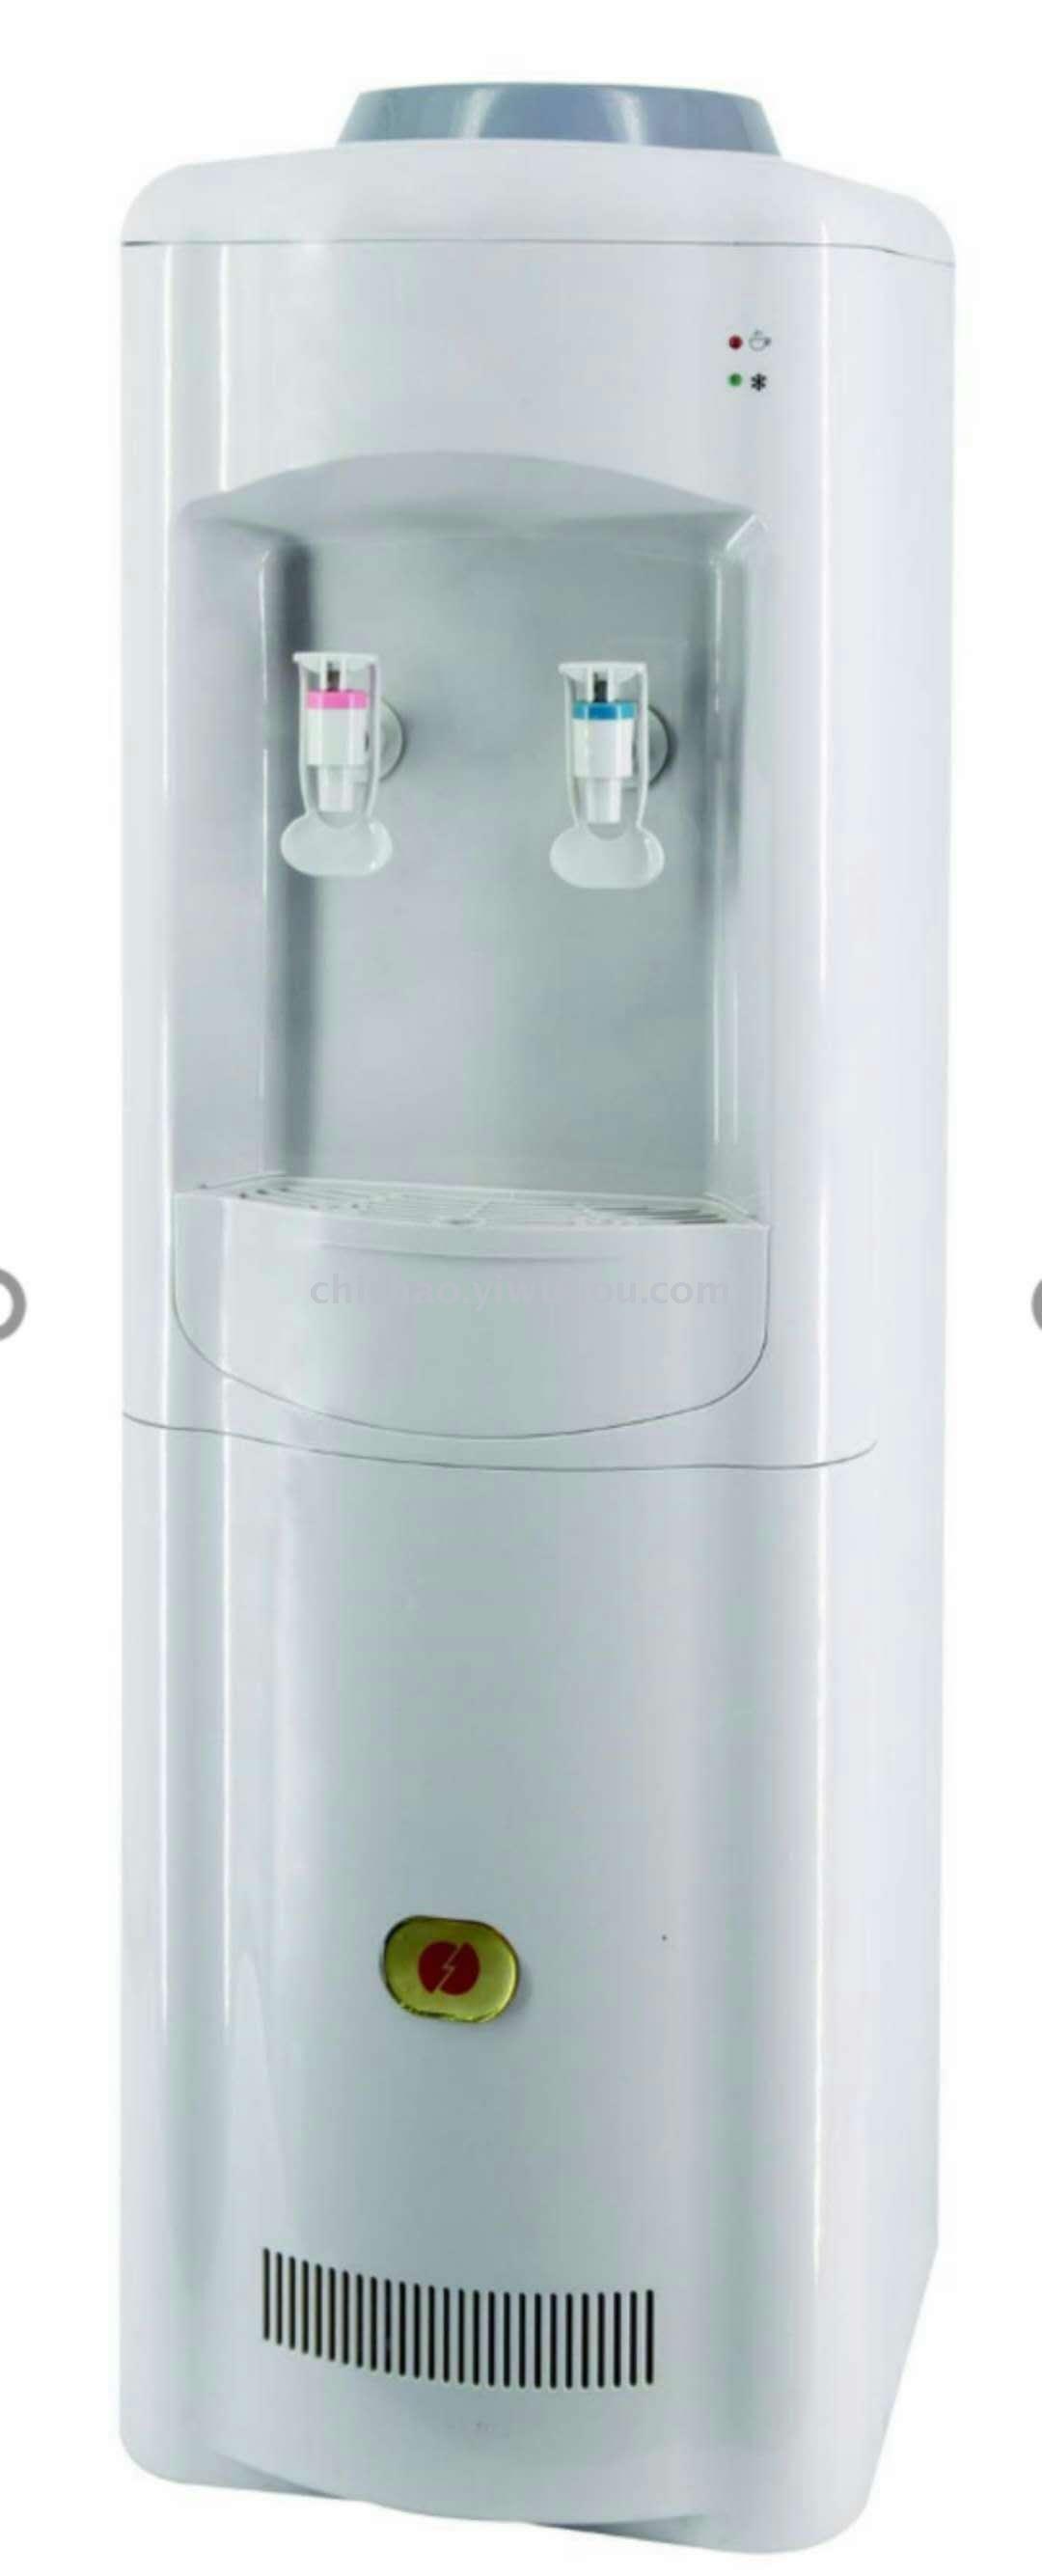 Supply Pipeline water dispenser, pipeline water dispenser, hot water ...